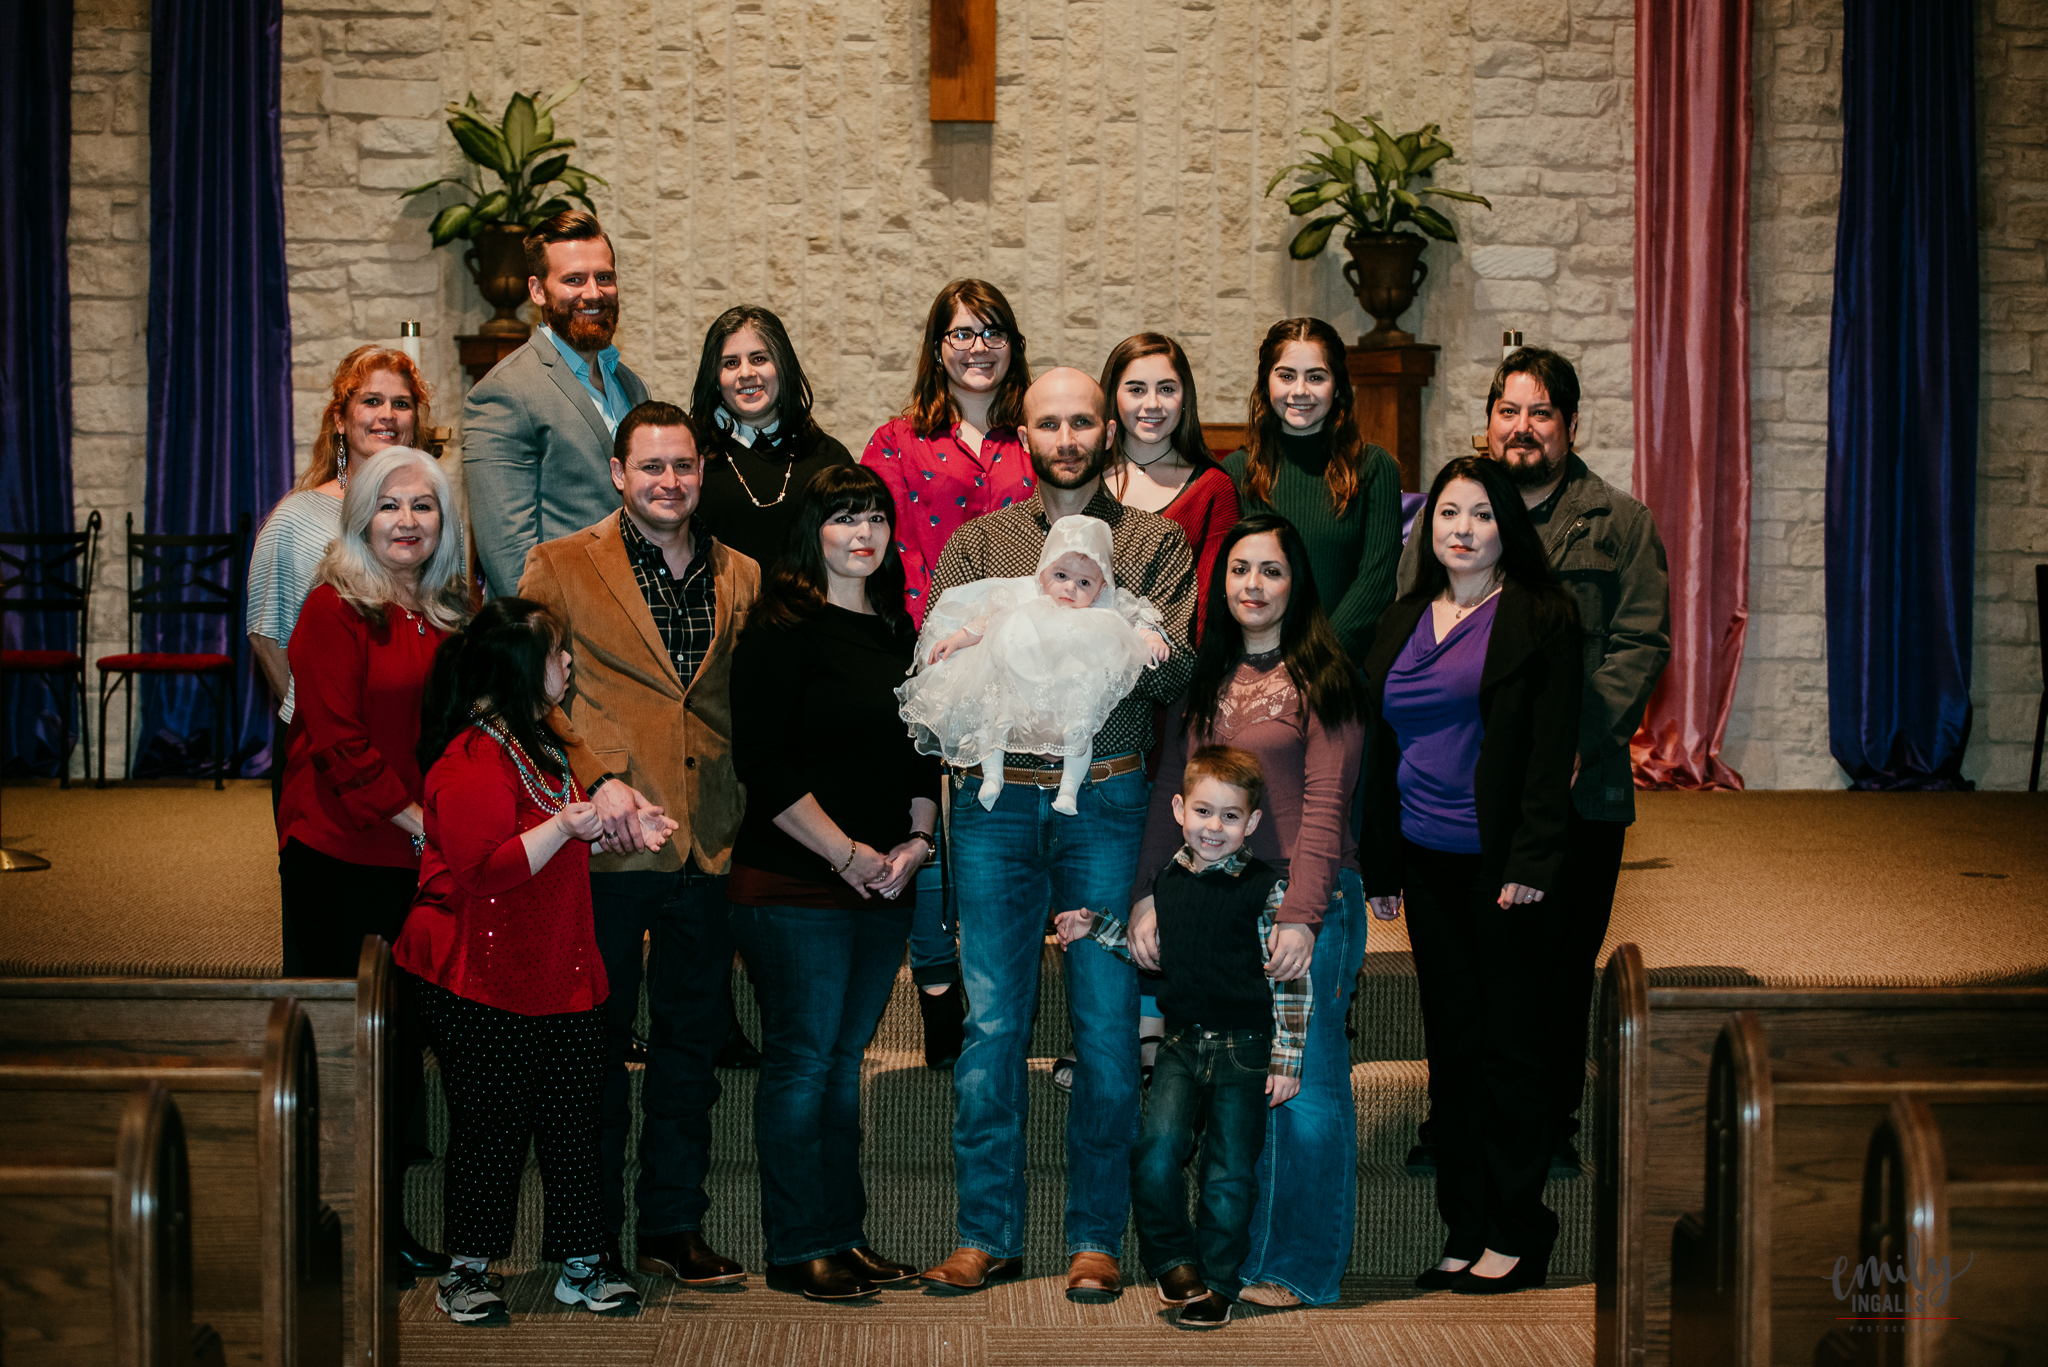 Baptism Photography_Round Rock Photographer_Emily Ingalls Photography_Austin Photographer_Pflugerville Photographer_Georgetown Photographer_St Elizabeth's Catholic Church Pflugerville-10.jpg